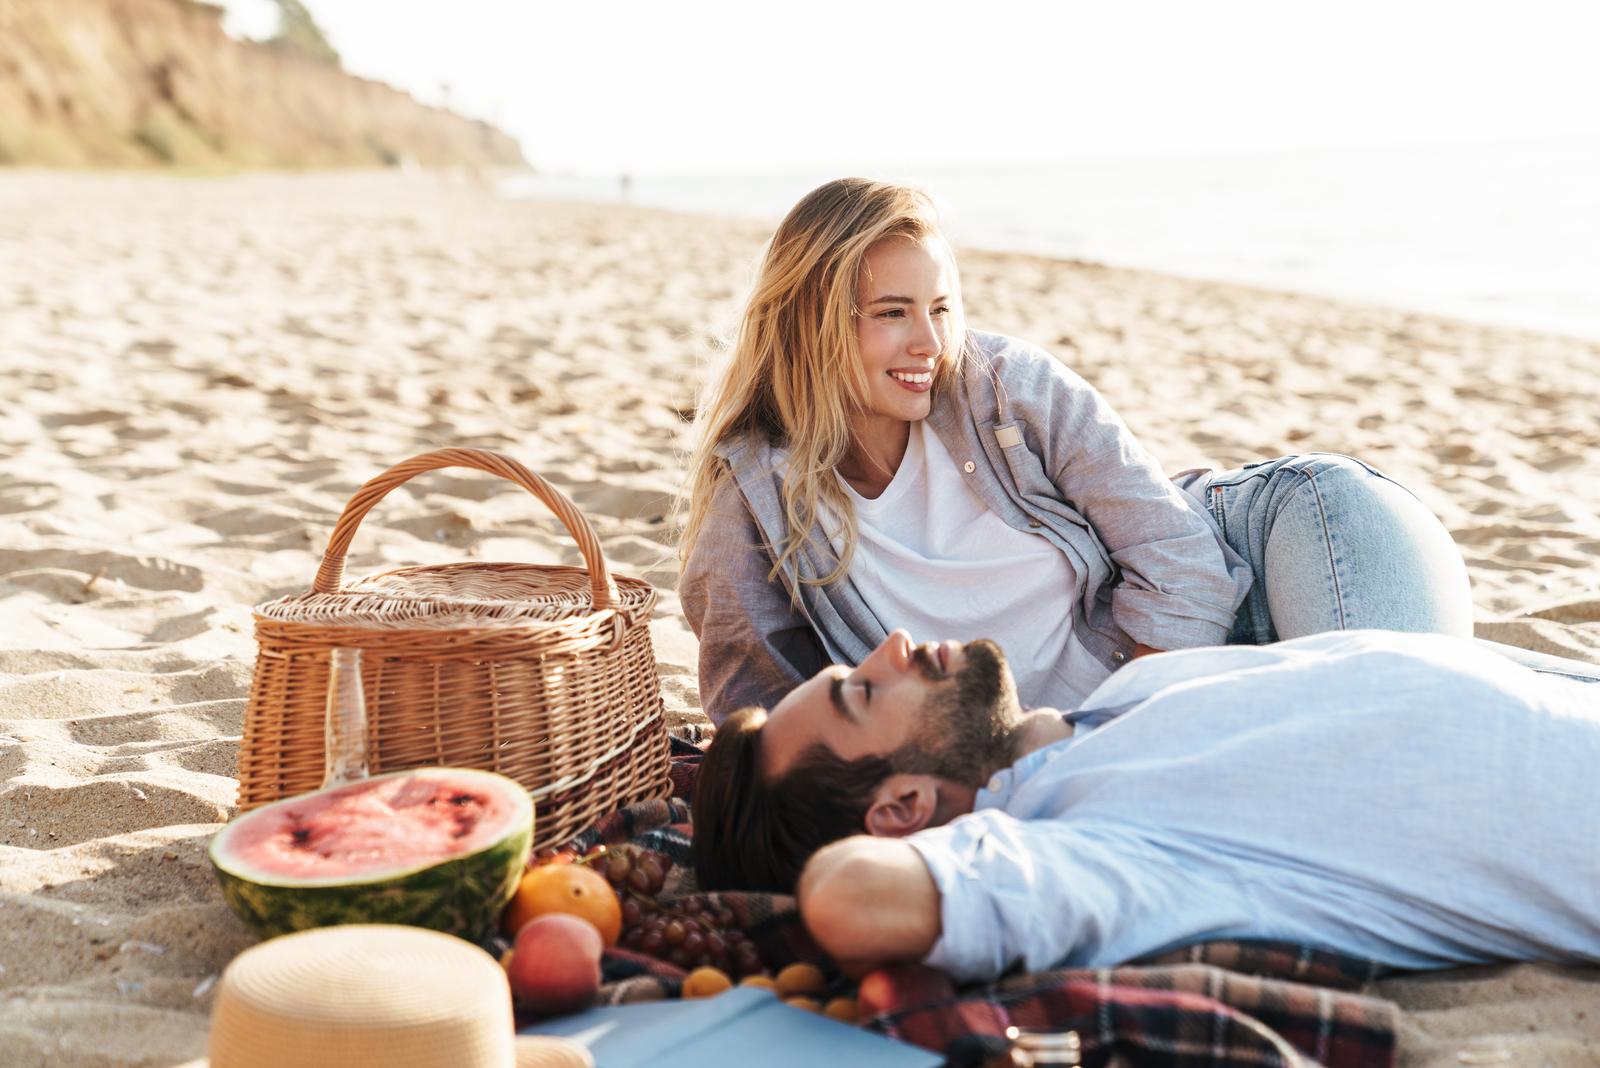 a man and a woman lie on the beach